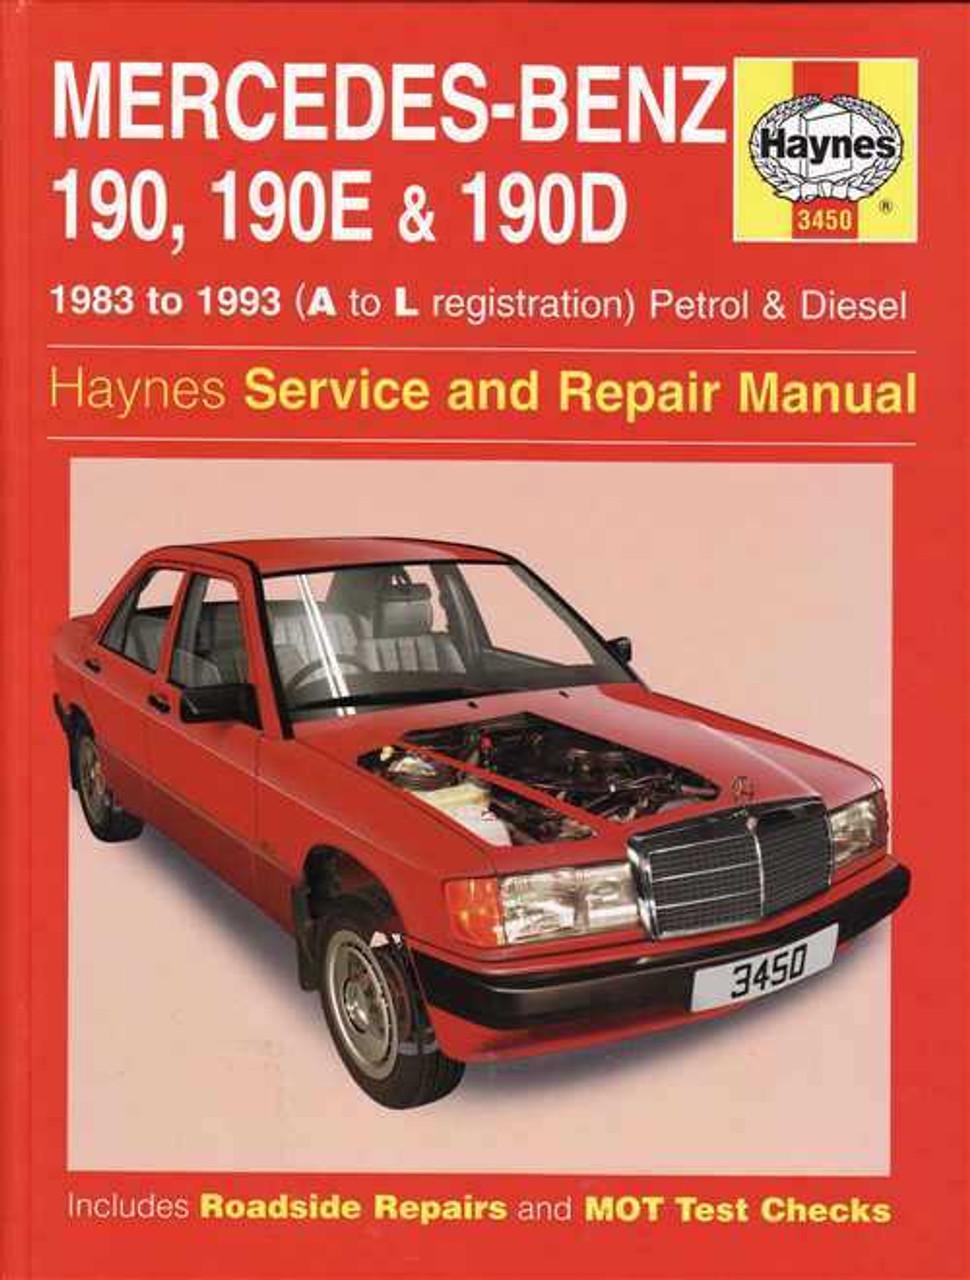 mercedes 450sel 6 9 in addition 1993 mercedes 190e engine diagram mercedes 190e 2 6 engine diagram [ 970 x 1280 Pixel ]